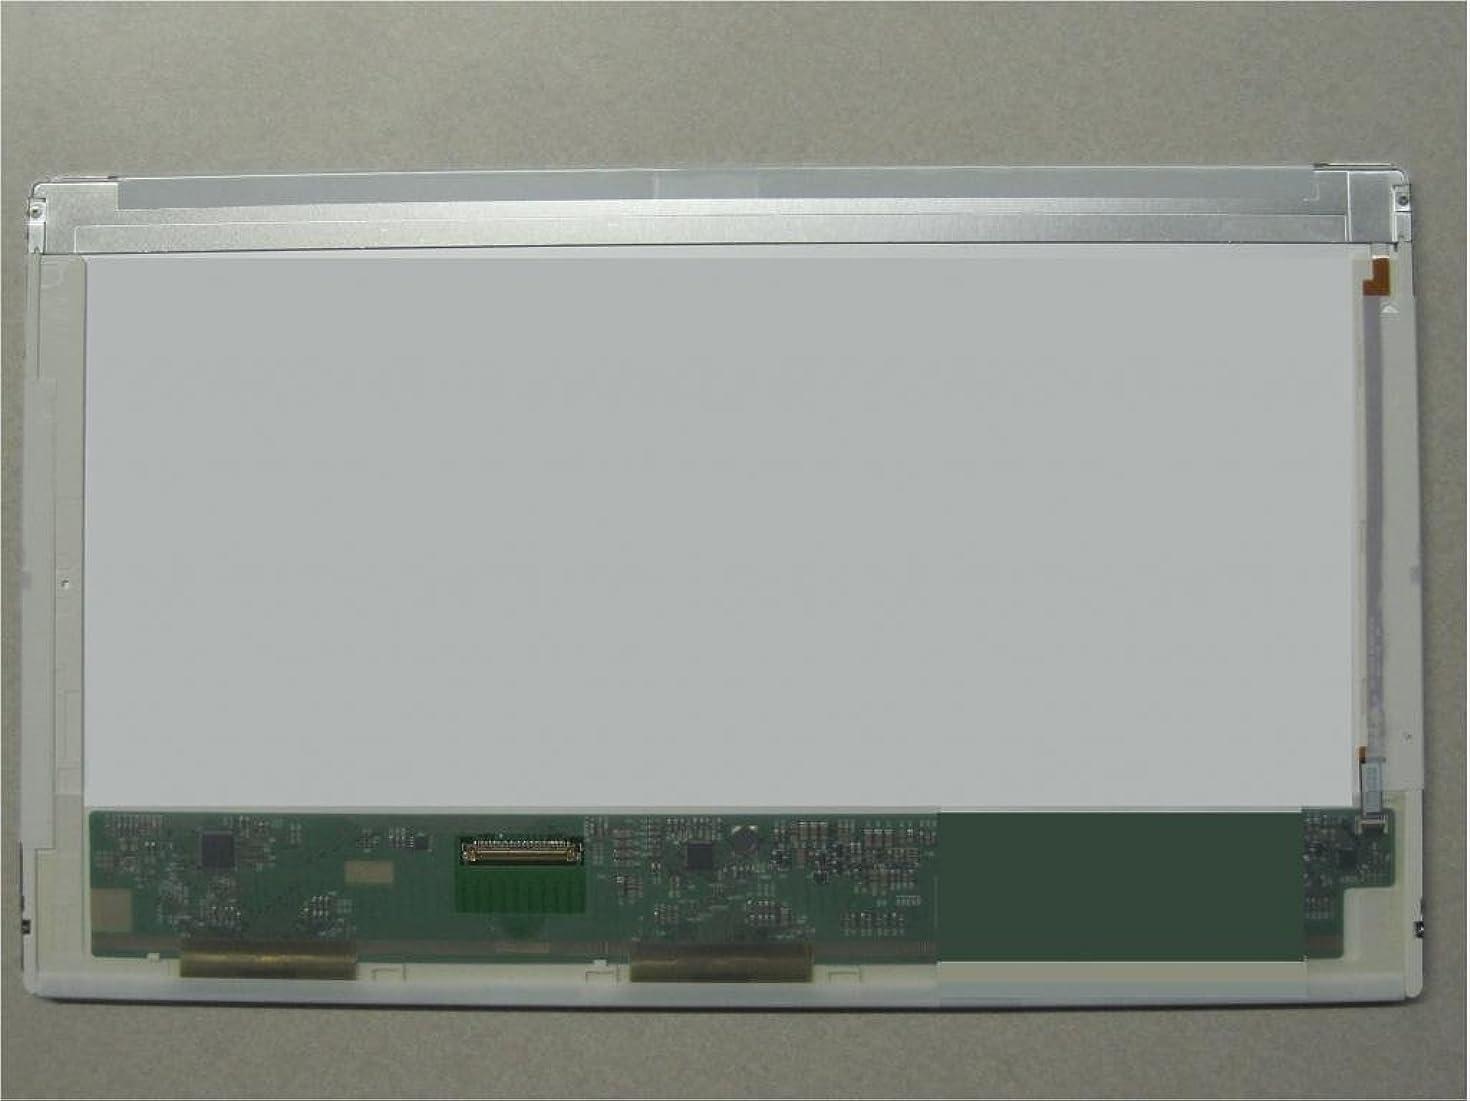 DELL LATITUDE E6430 Laptop replacement 14